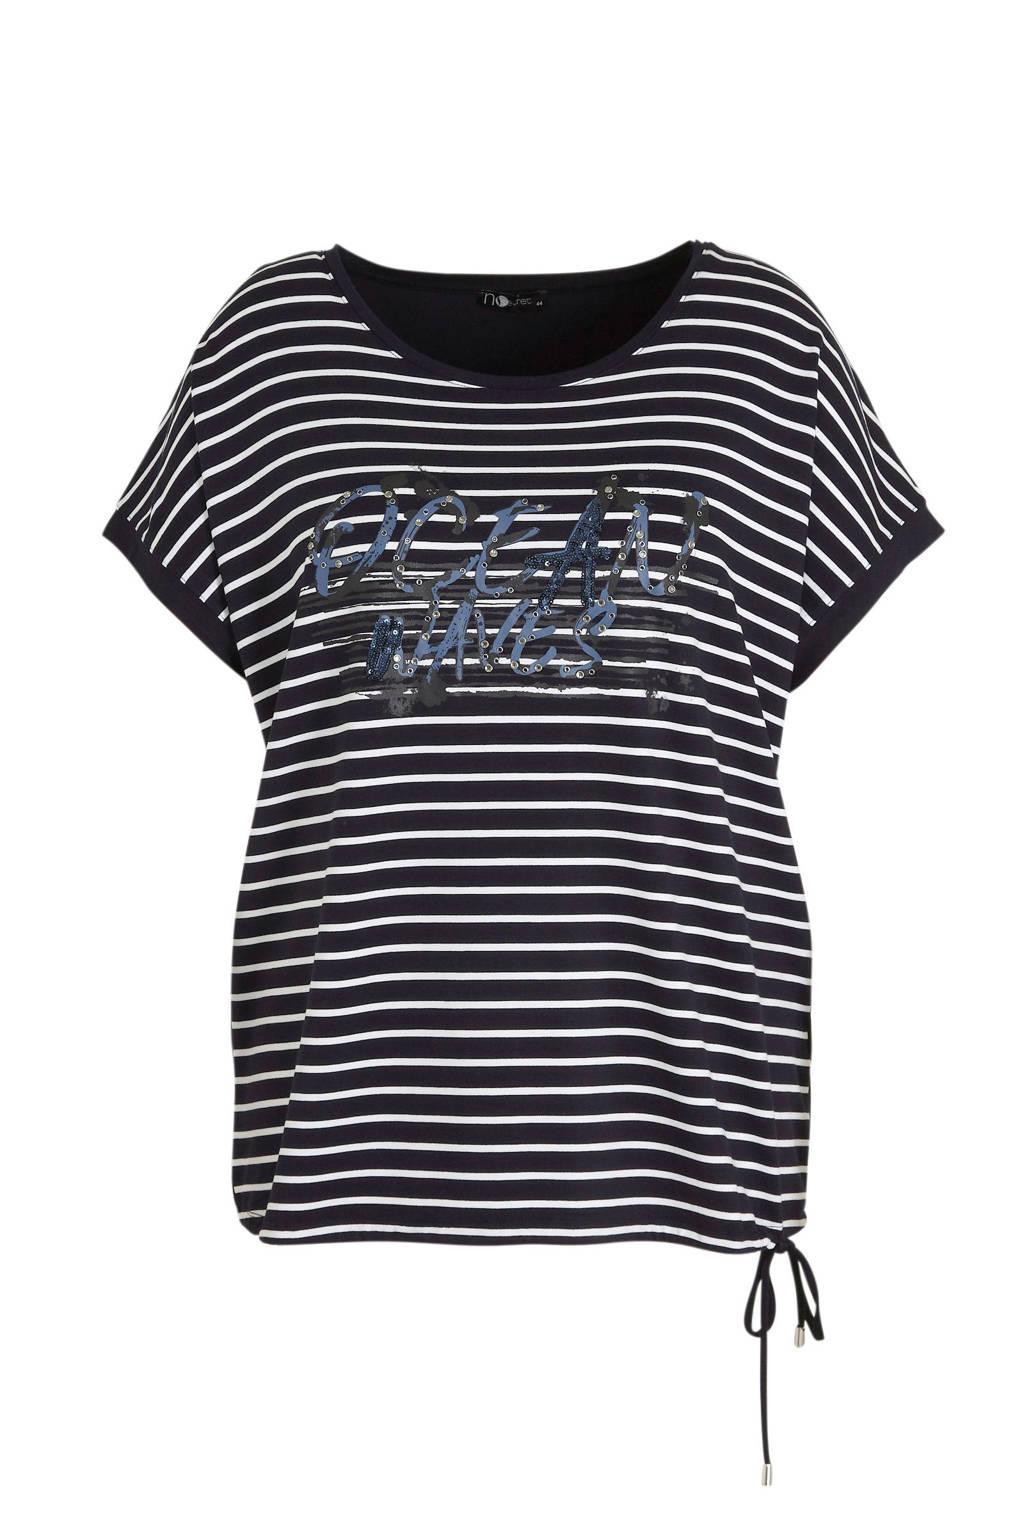 No Secret gestreept T-shirt donkerblauw, Donkerblauw